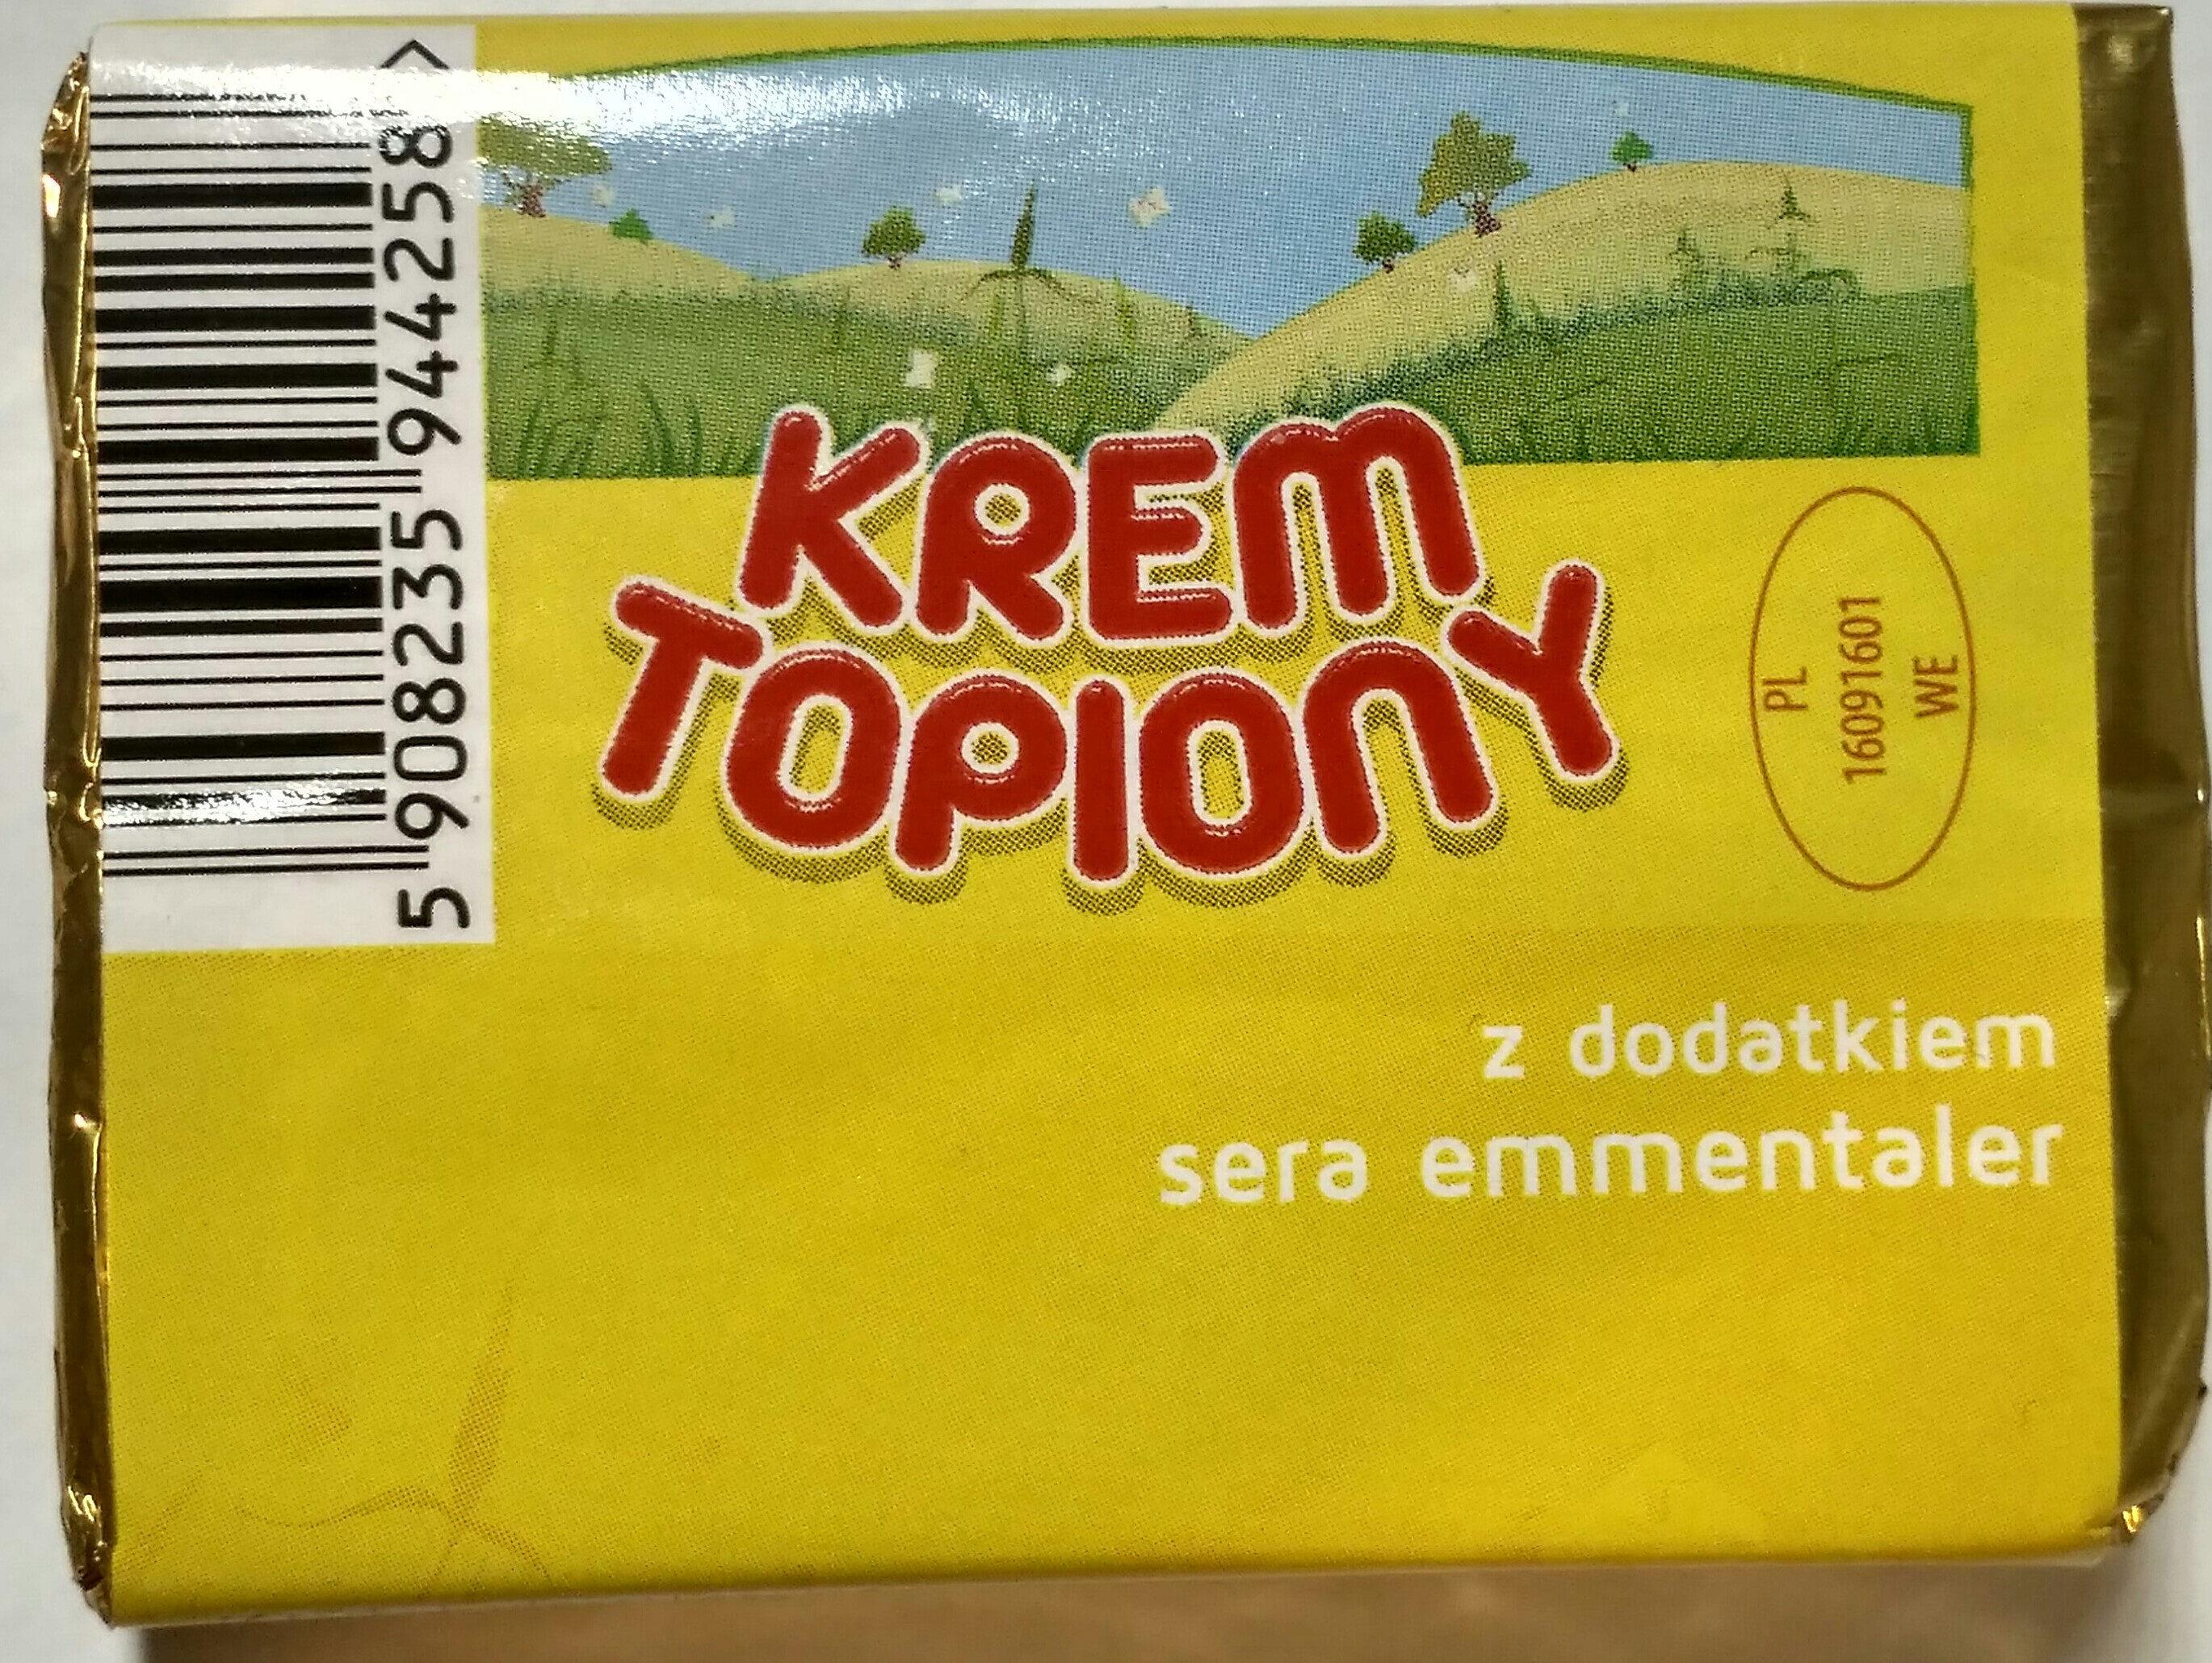 Krem topiony z dodatkiem sera emmentaler - Product - pl